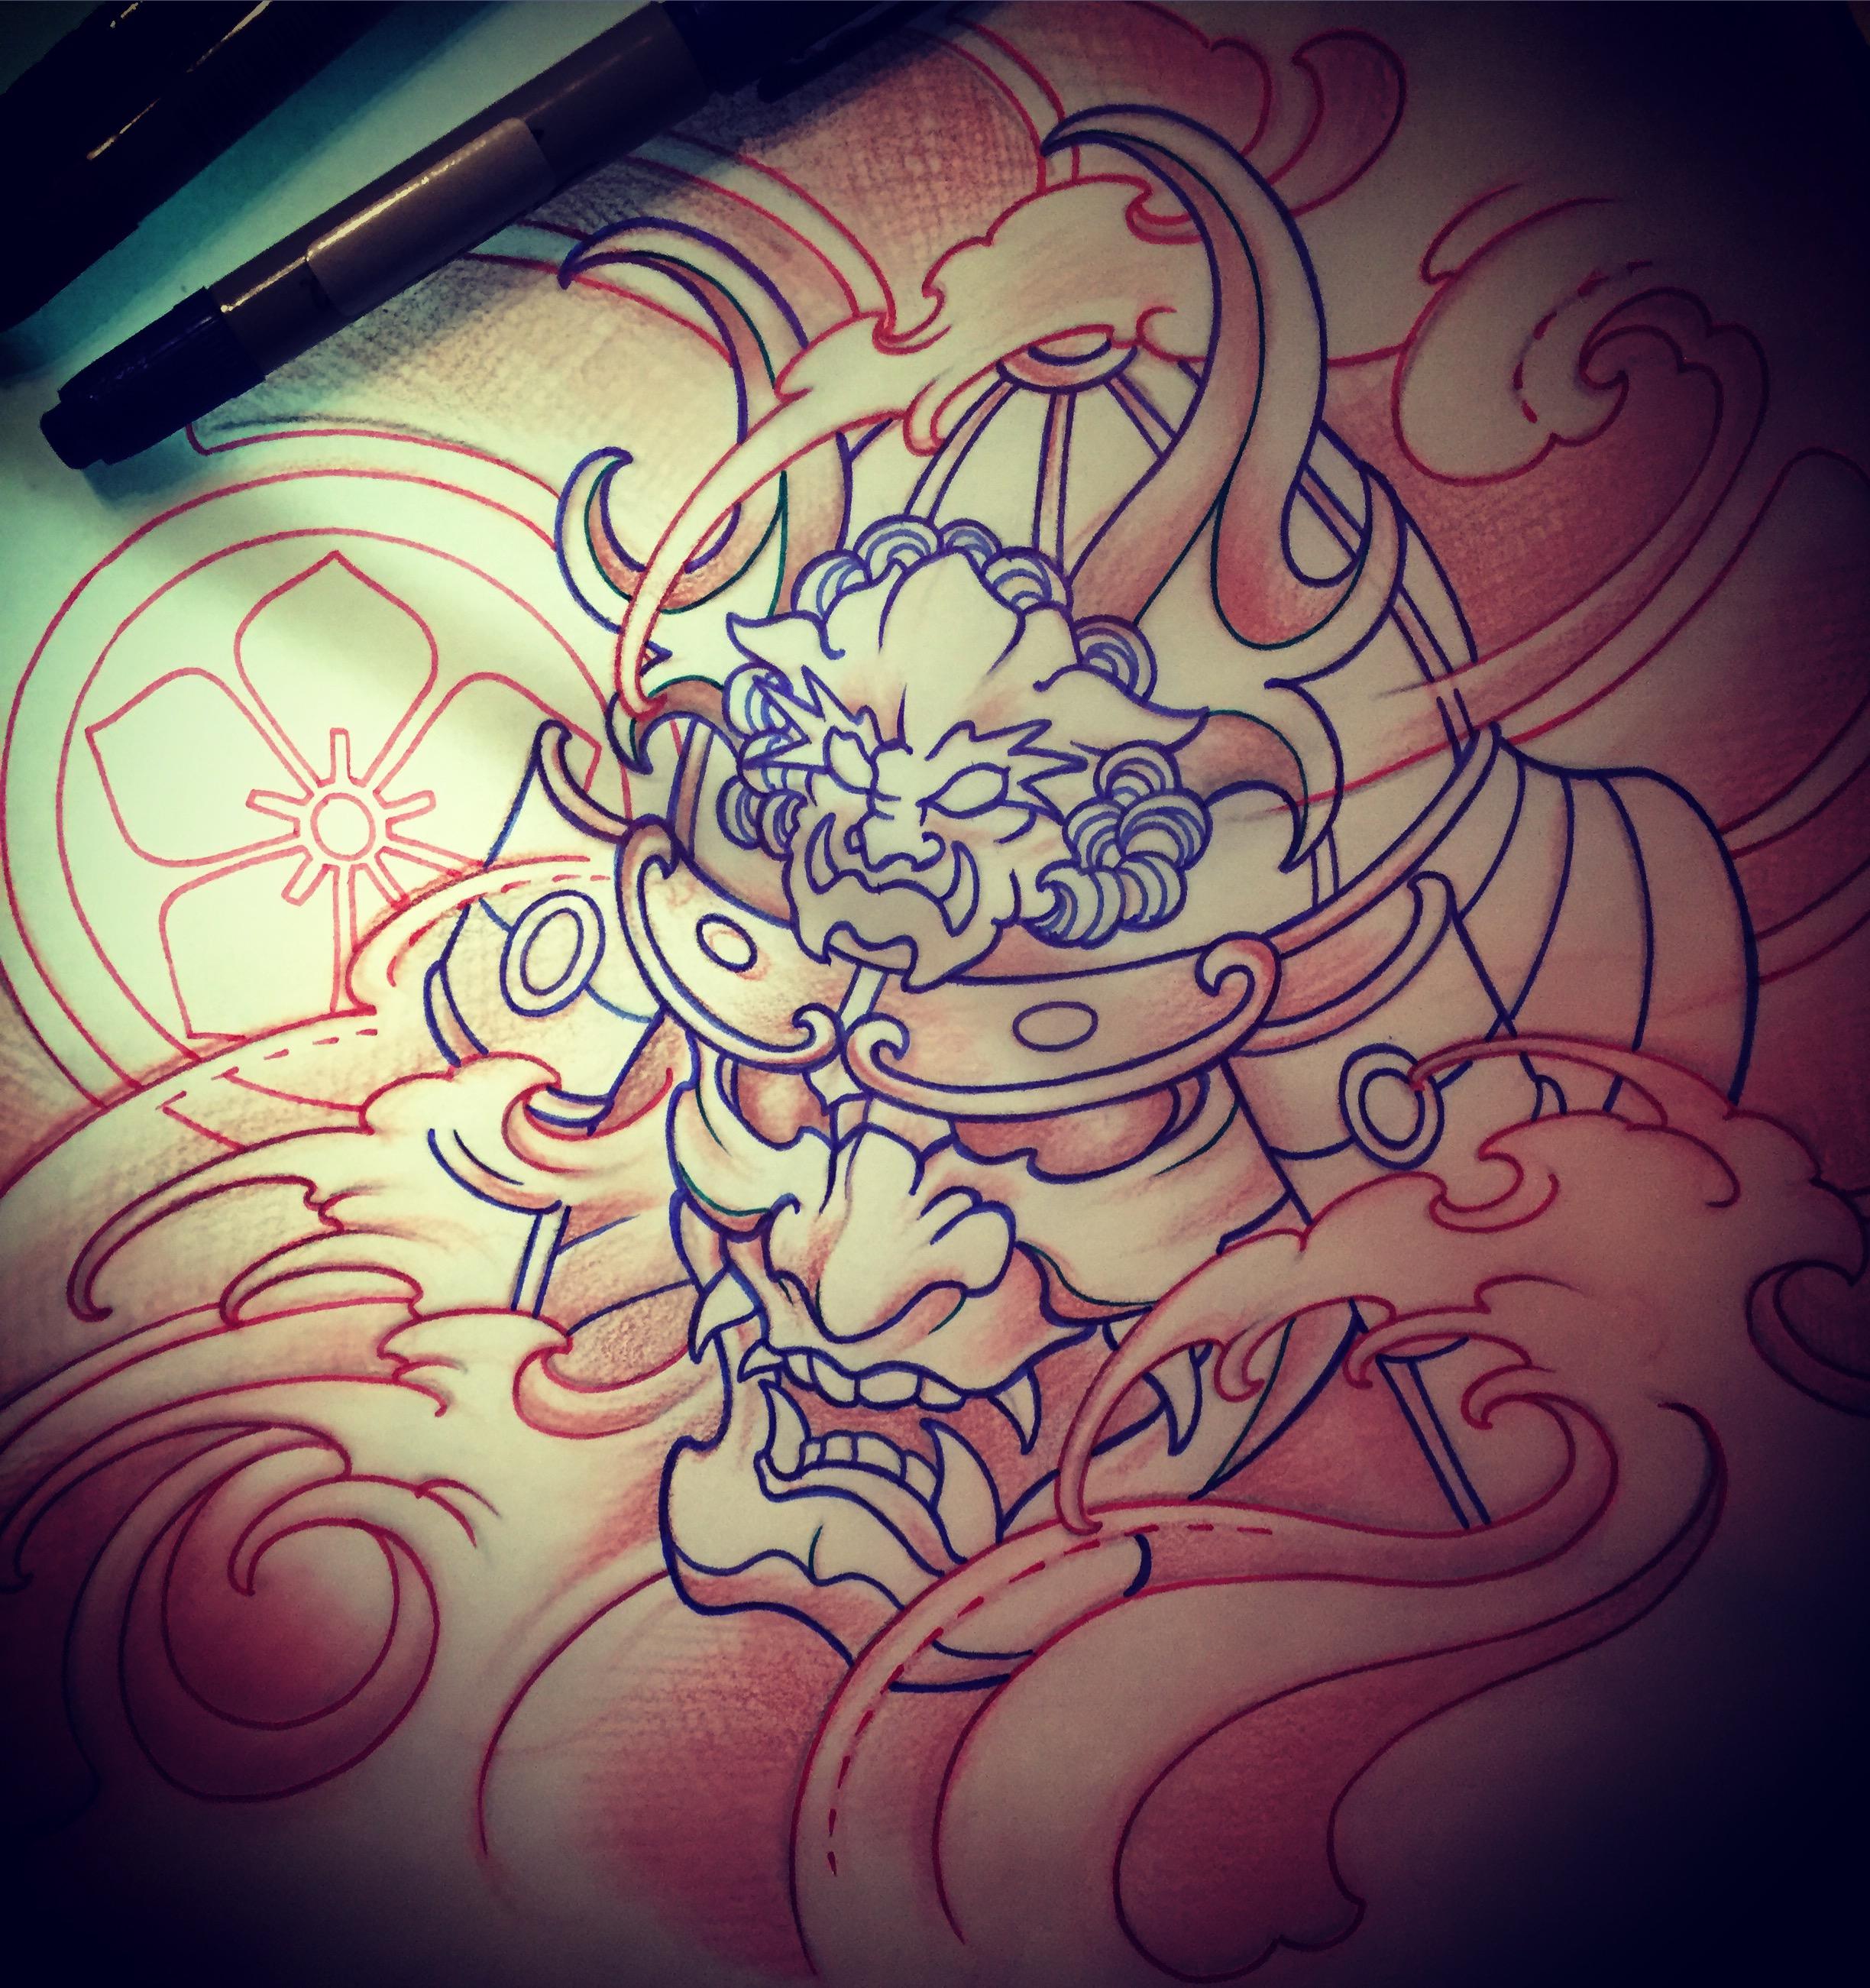 2448x2602 Amsterdam Tattoo 1825 Kimihito Samurai Mask Tattoo Design